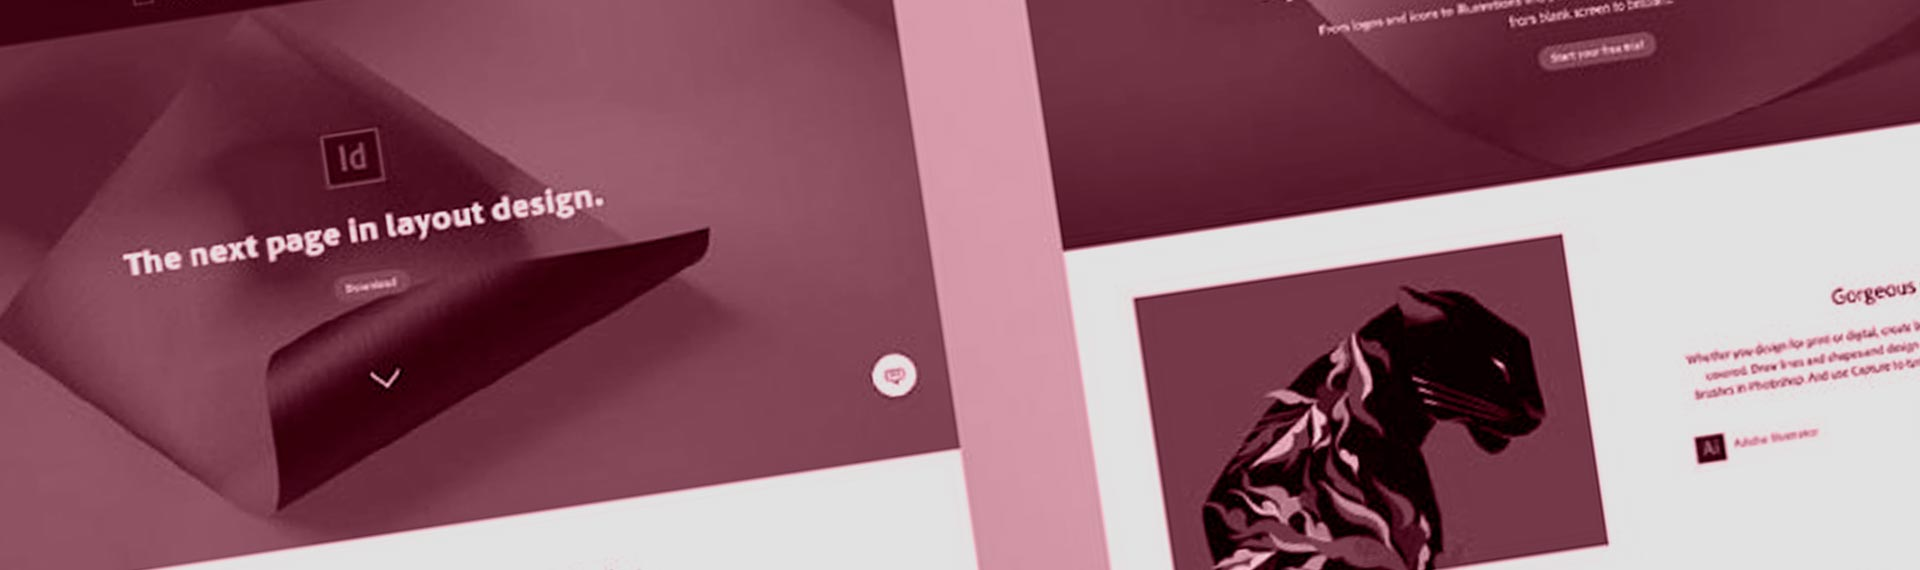 Wat kun je nou precies met Adobe InDesign?